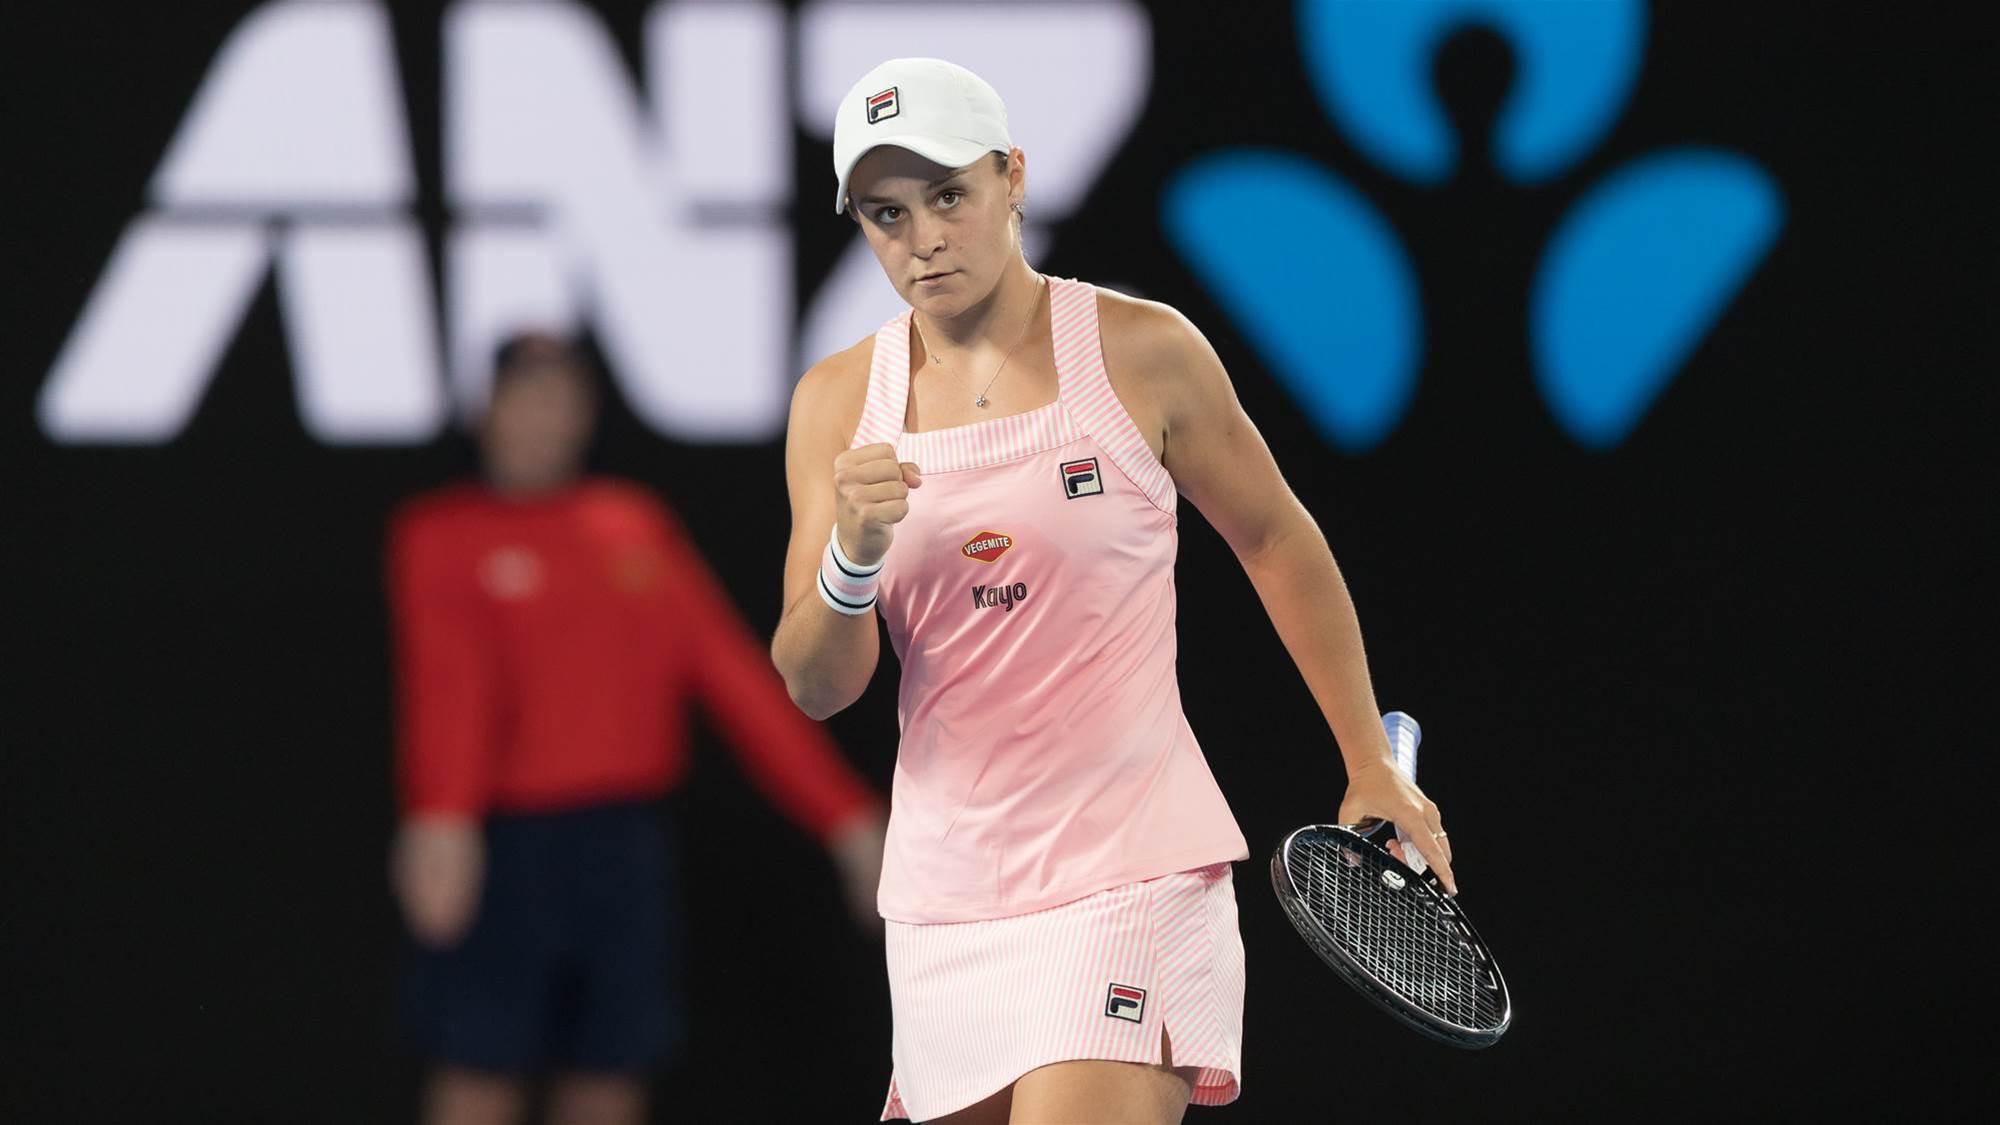 Barty to face Kvitova in Miami quarters